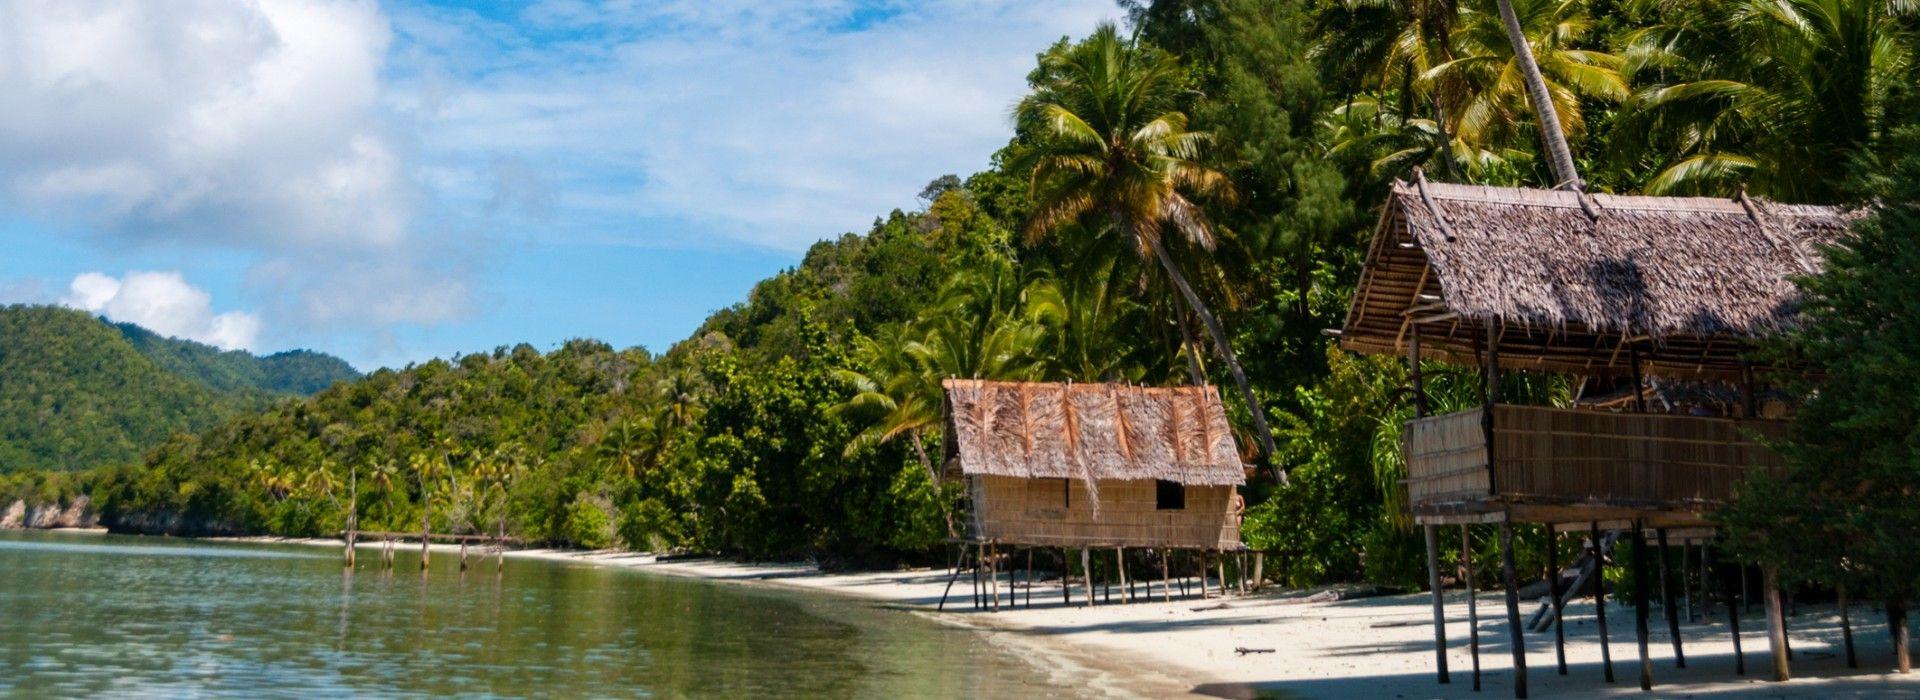 Papua New Guinea Tours and Trips to Papua New Guinea